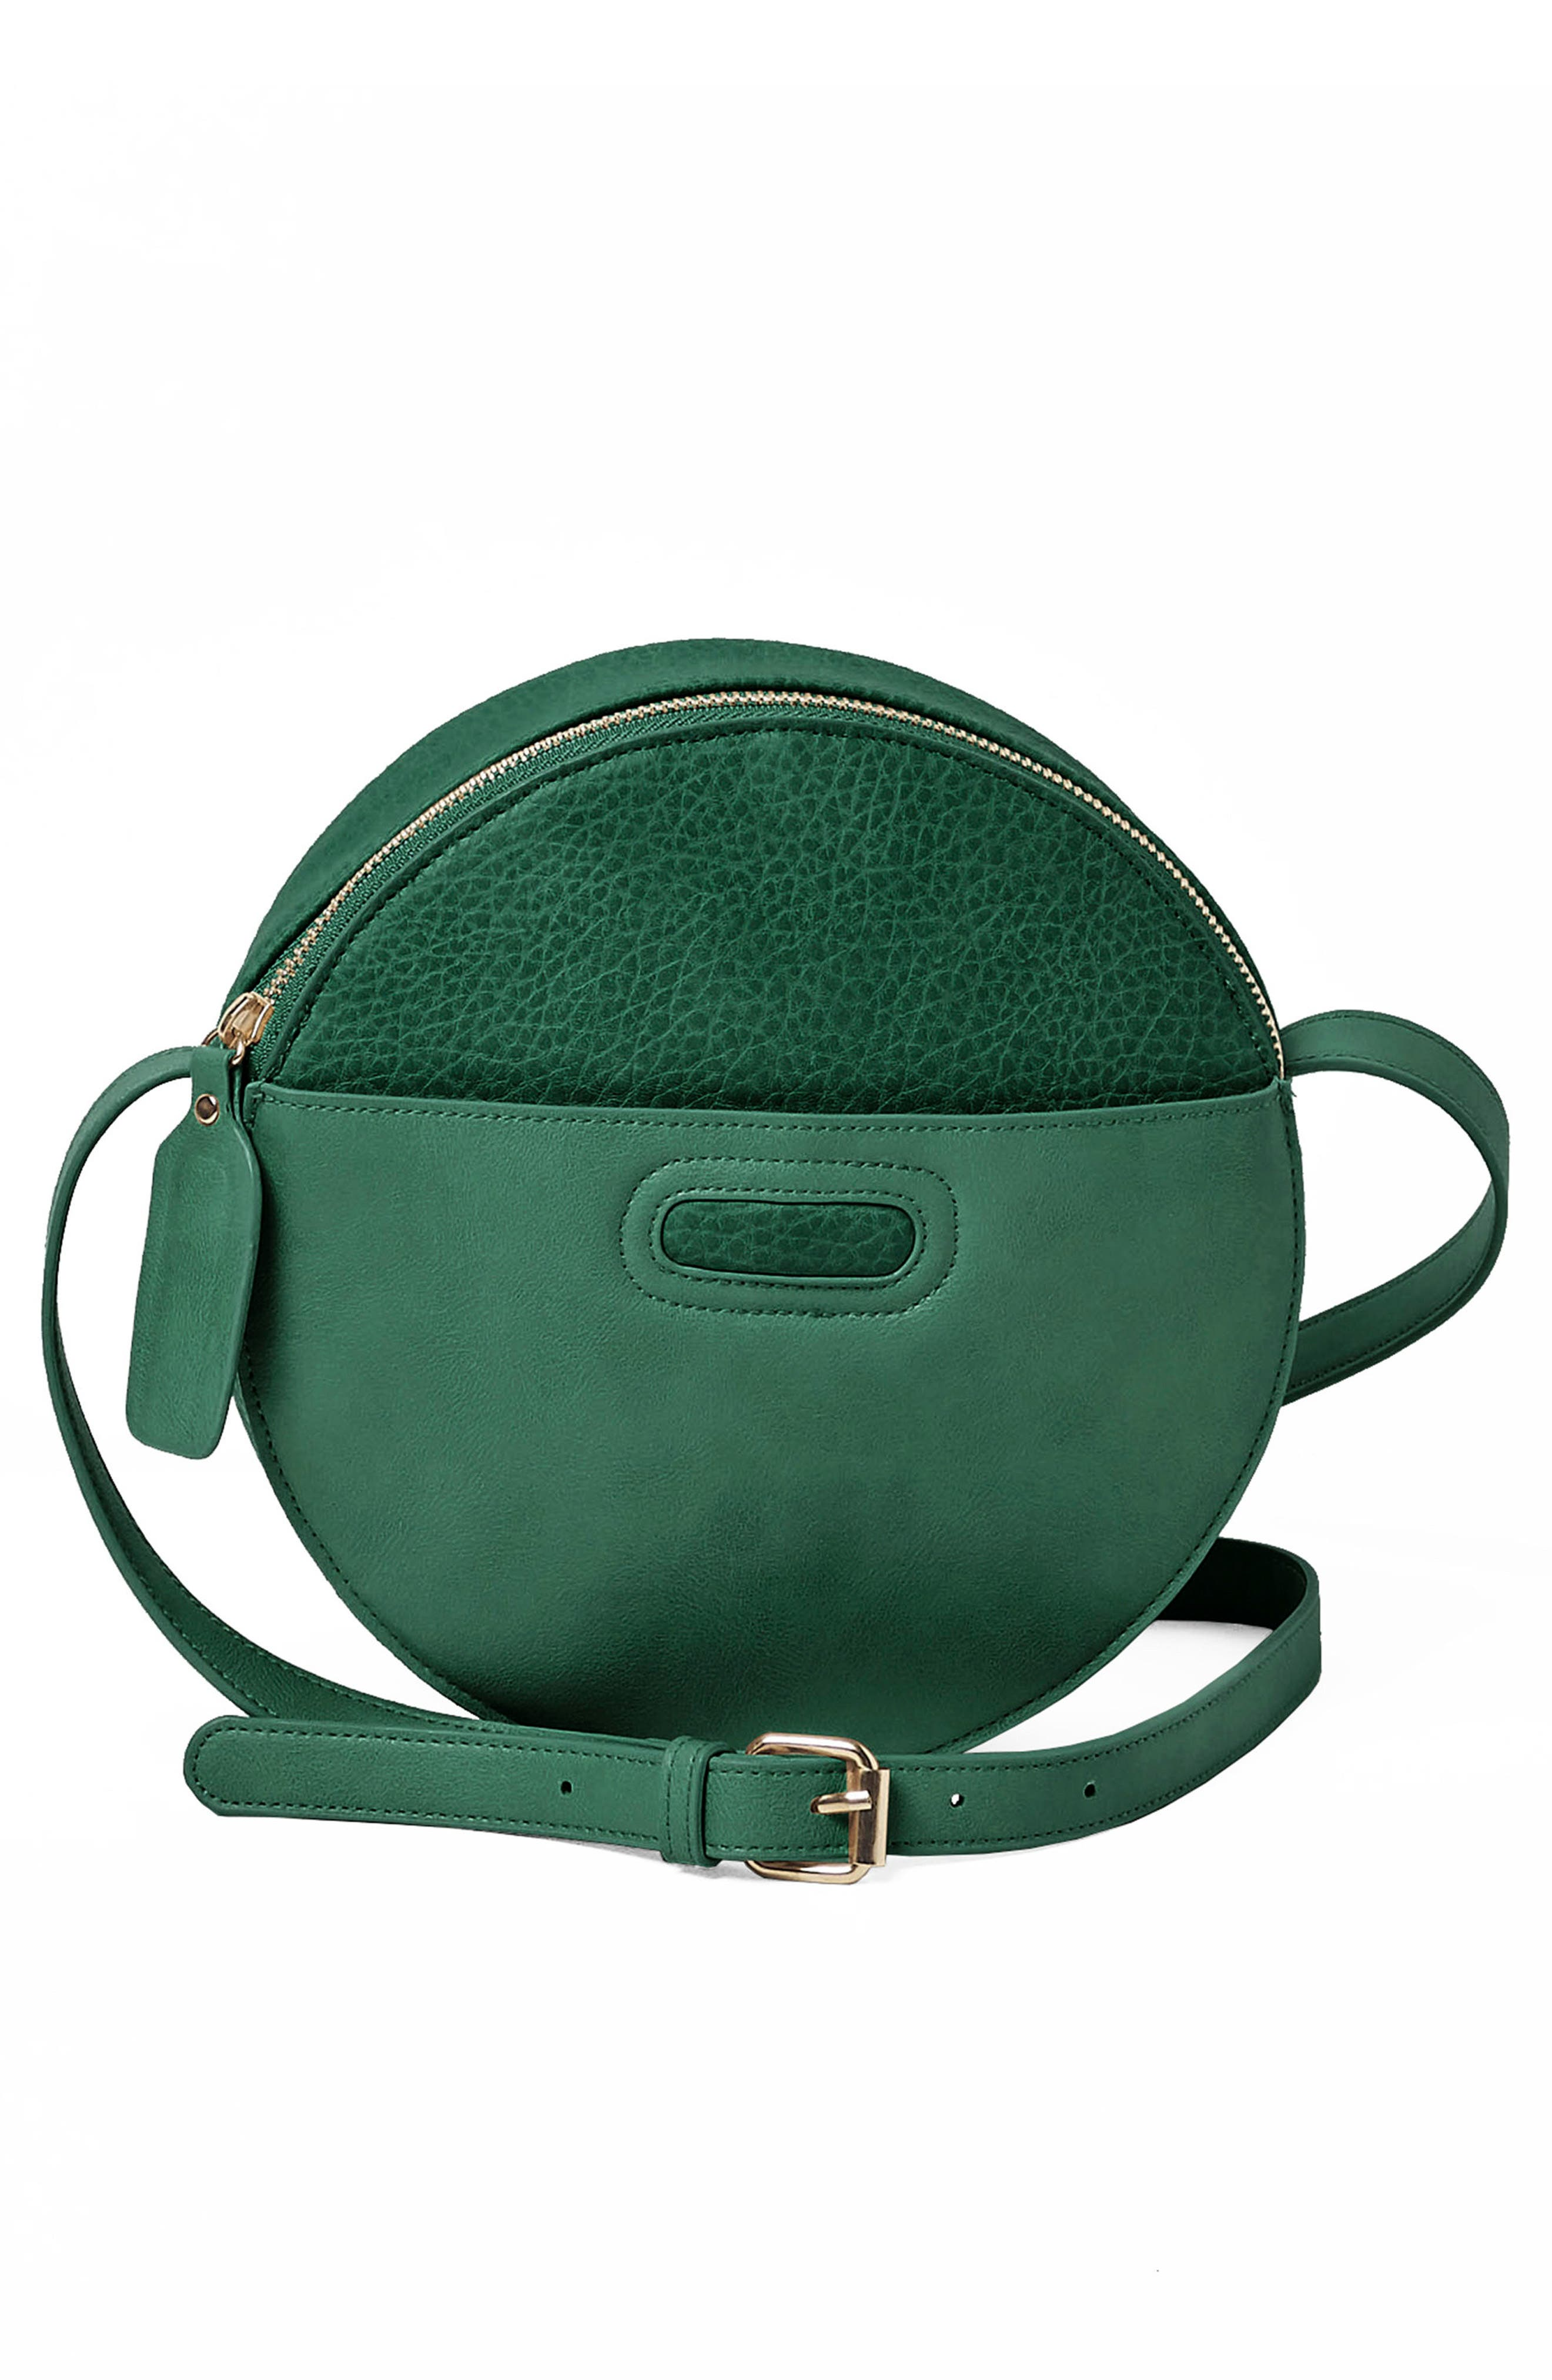 Carousel Vegan Leather Crossbody Bag,                         Main,                         color, Emerald